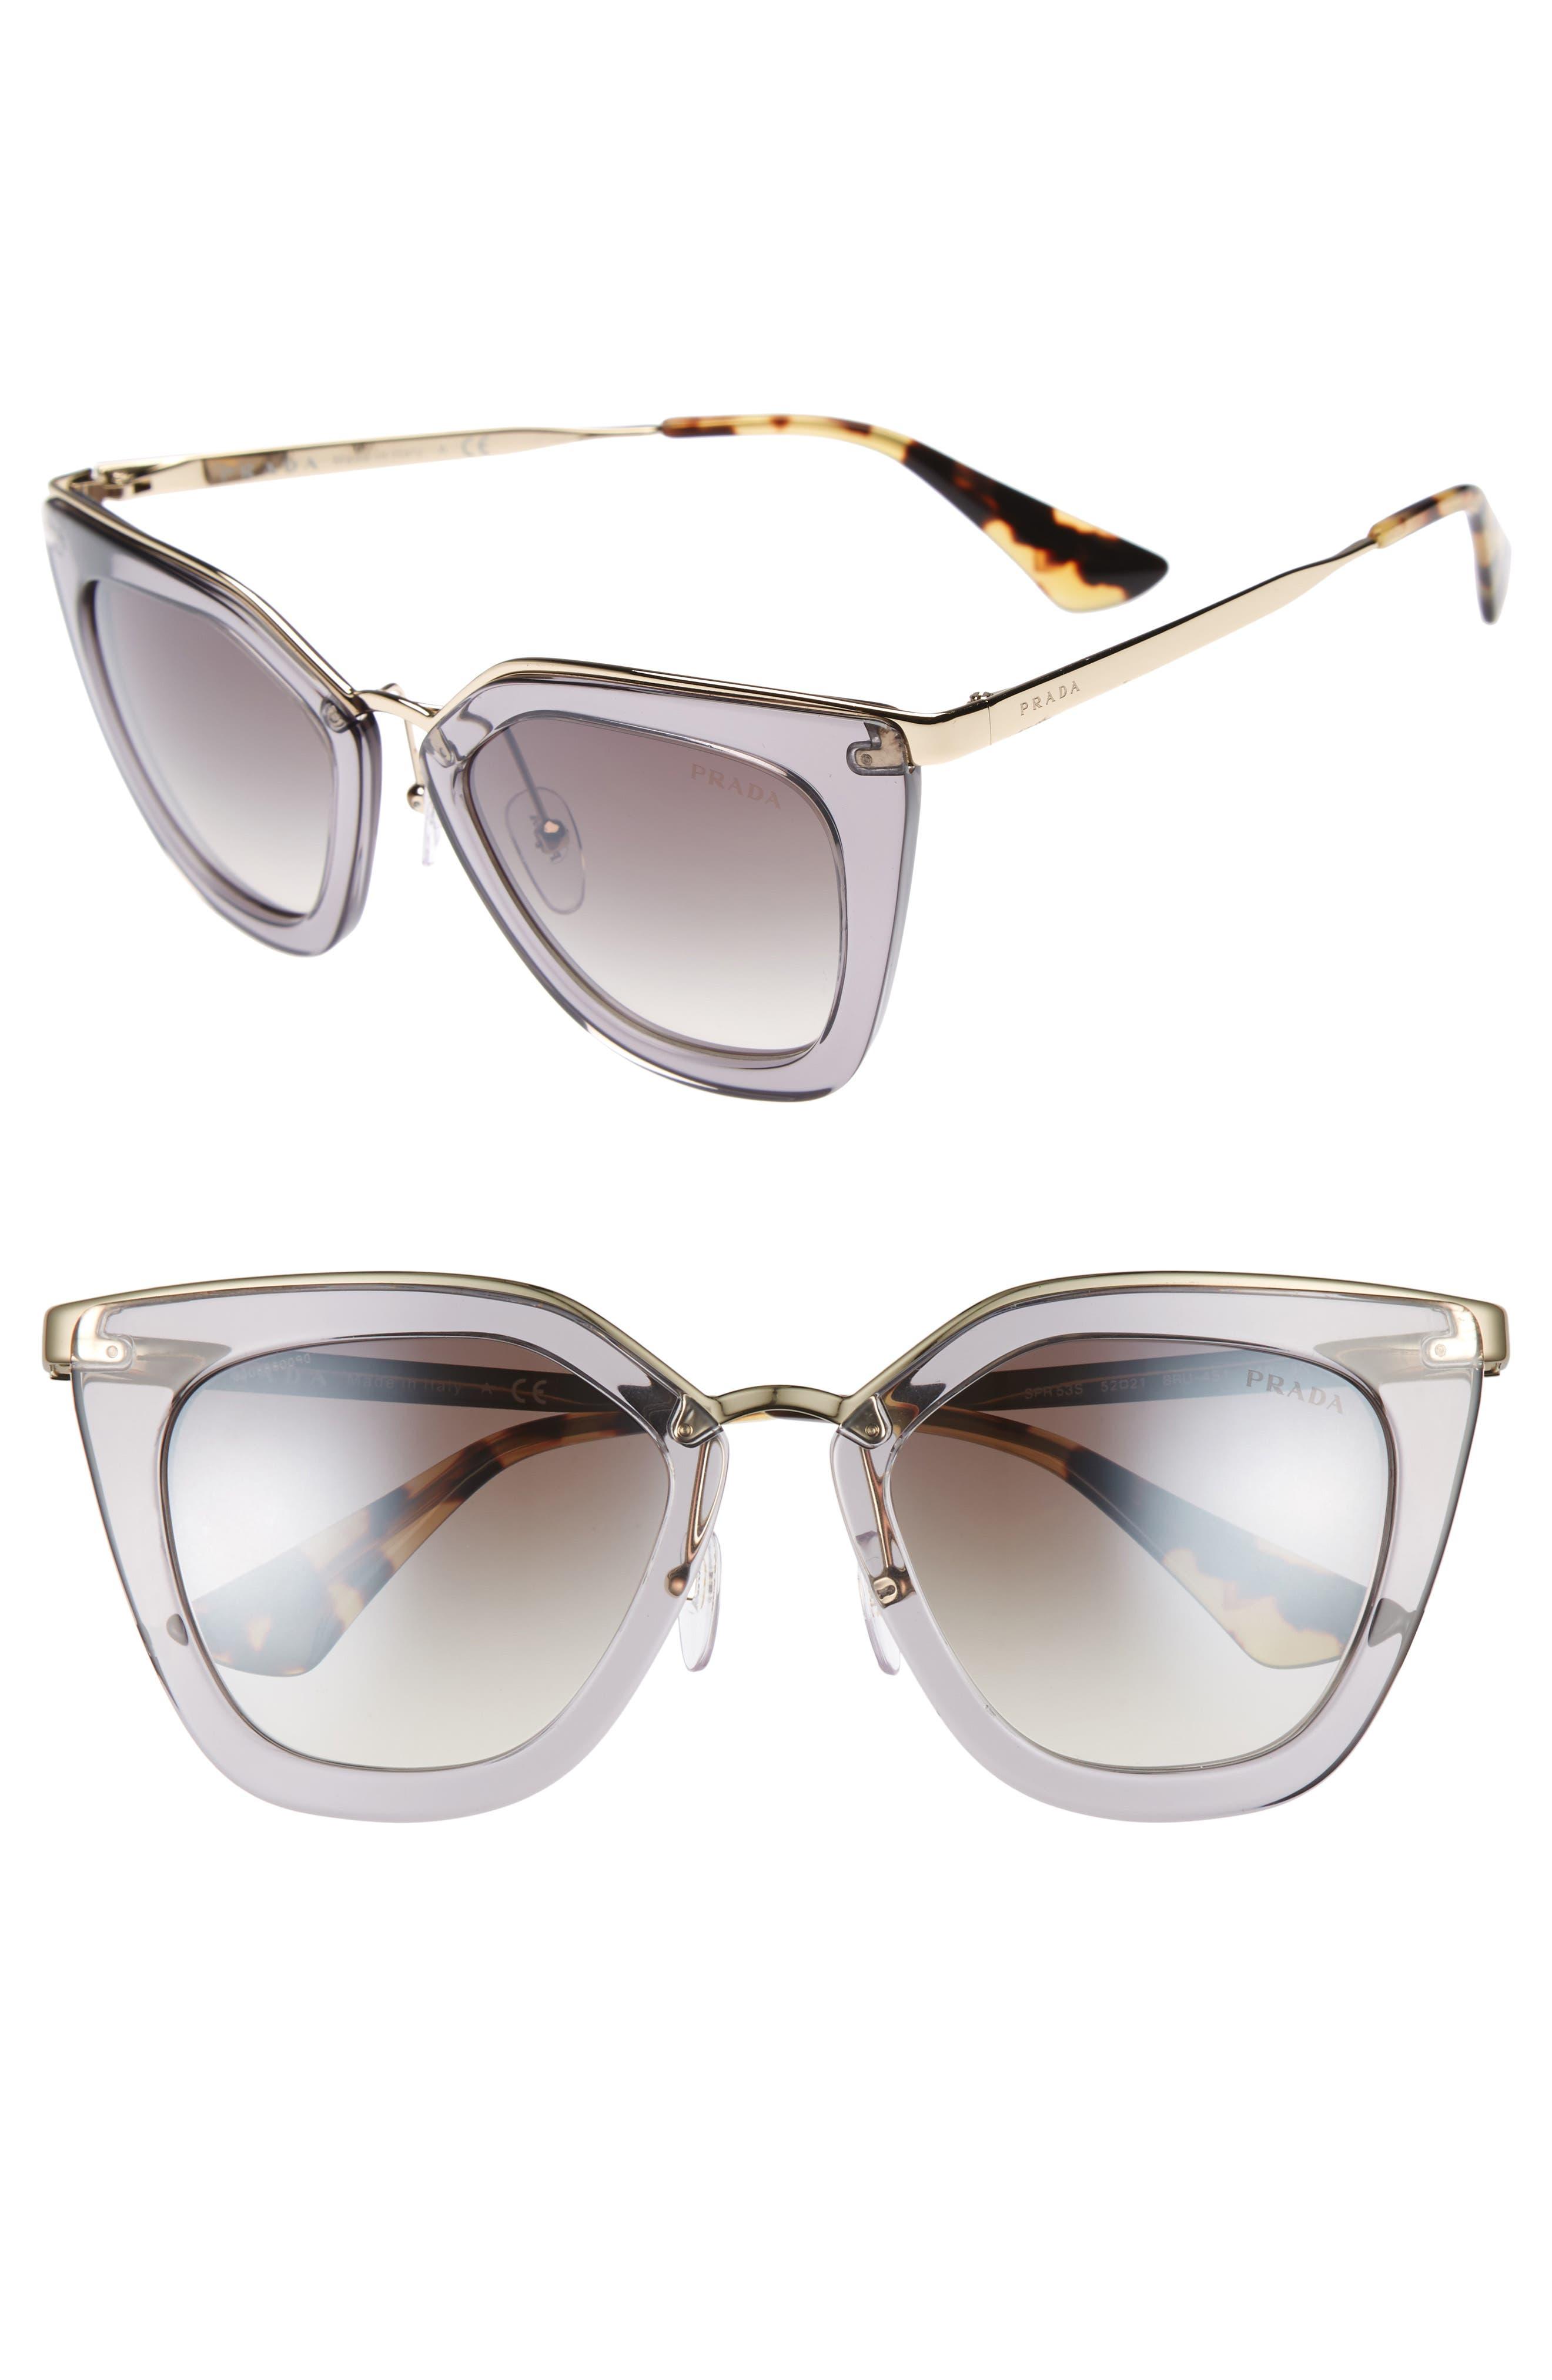 Prada 52mm Gradient Cat Eye Sunglasses